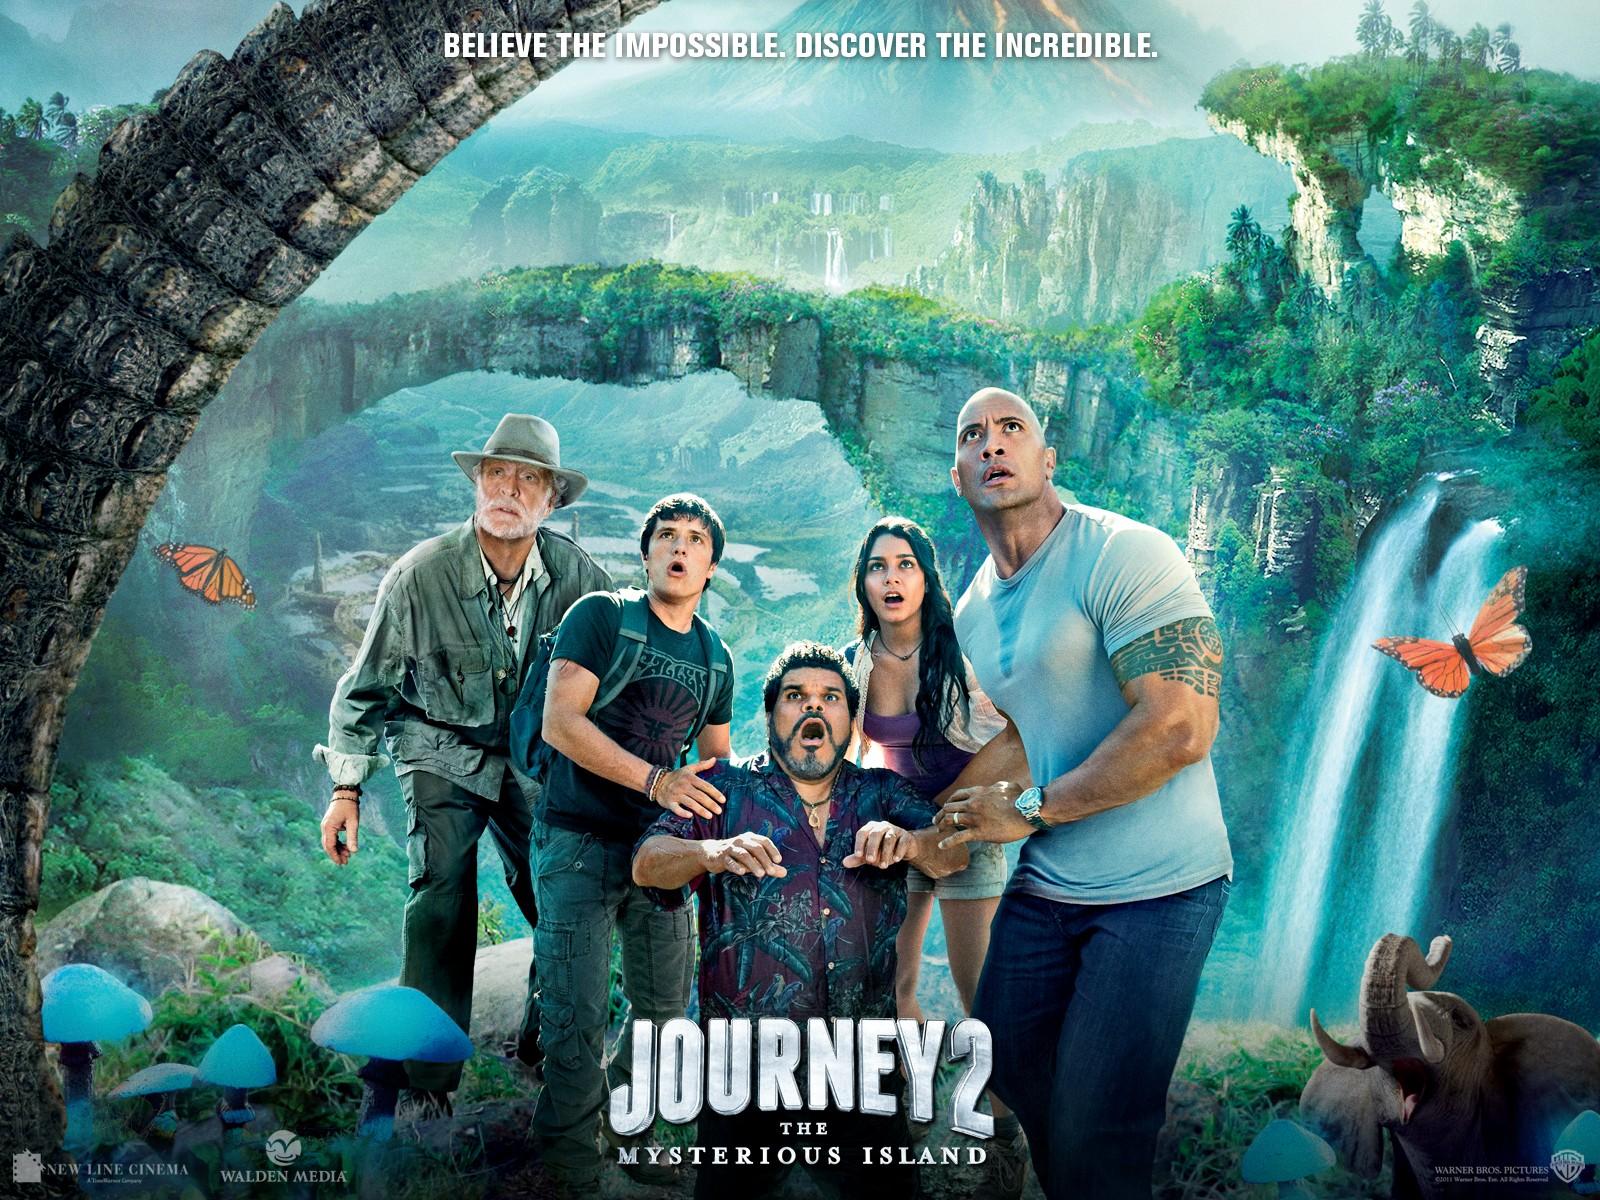 animal journey 2 really amazing movie